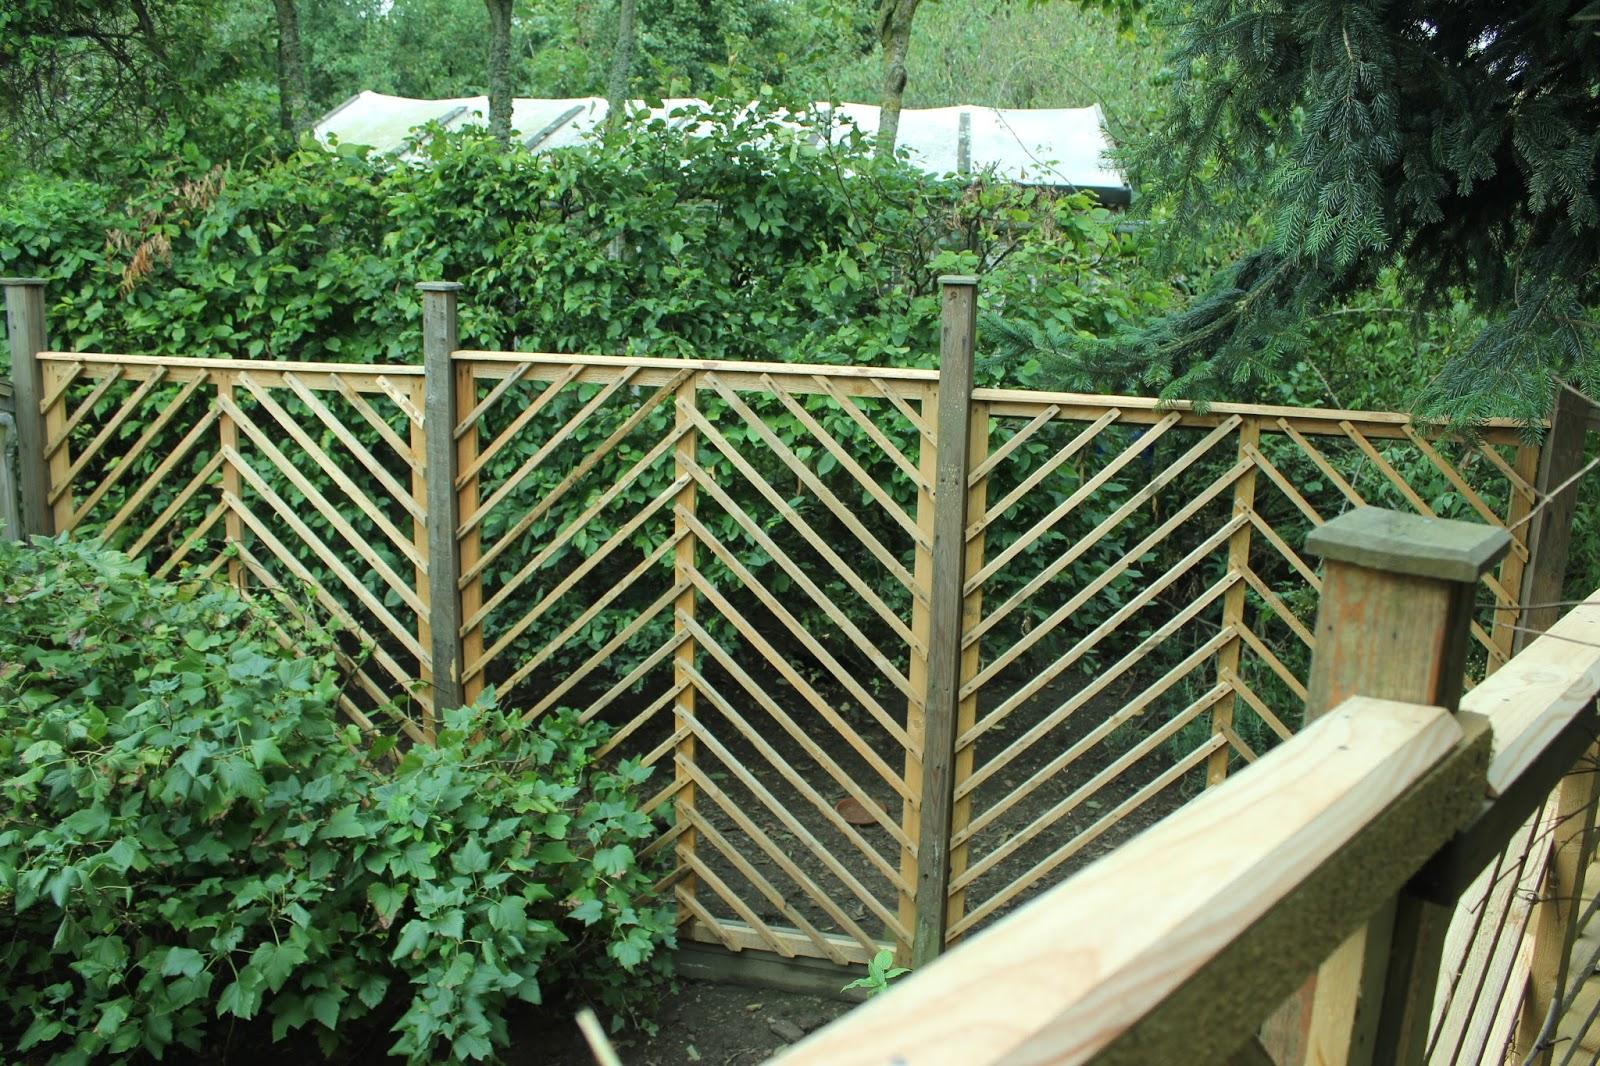 Diy Garden Gazebo From Pallet Wood Part 2 Trellis Panels